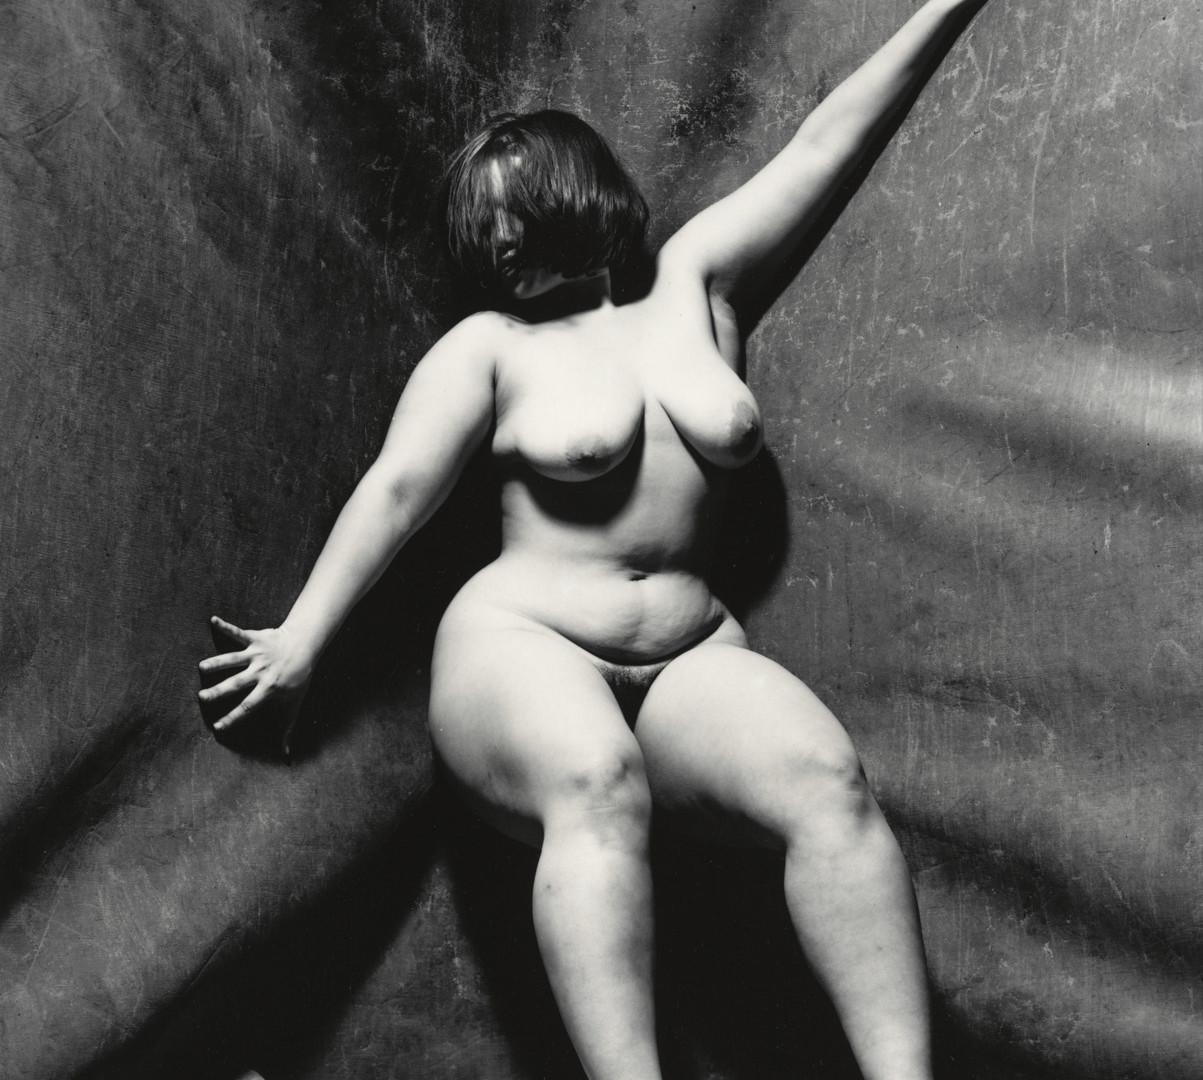 Irving Penn, Alexandra Beller (AA), New York, 1999